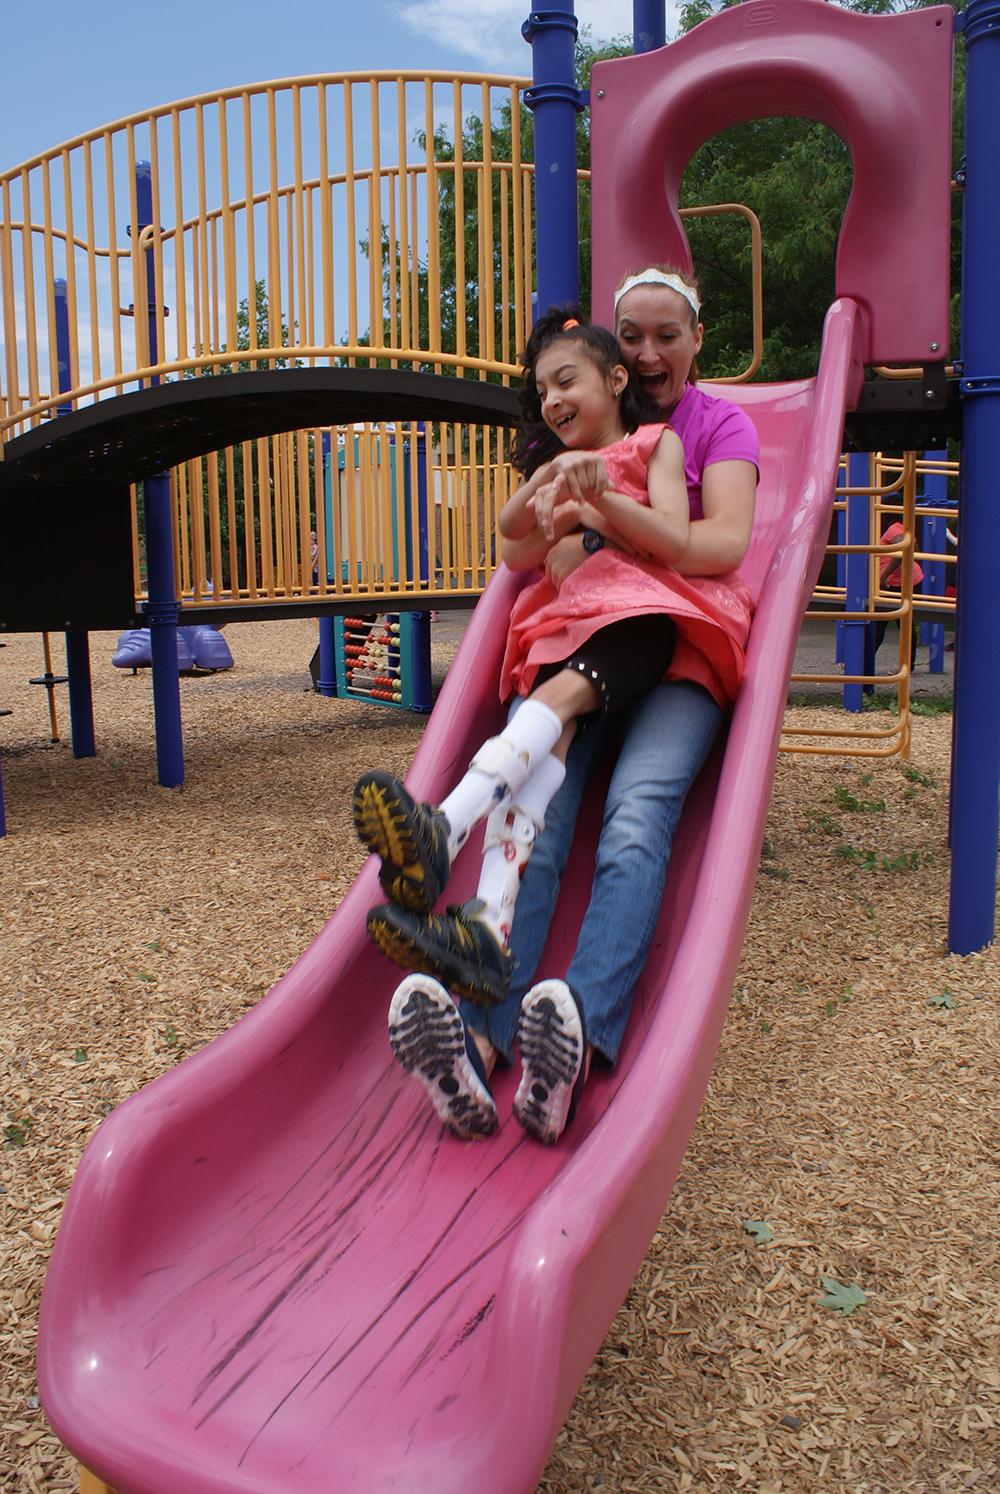 Enji enjoying the playground